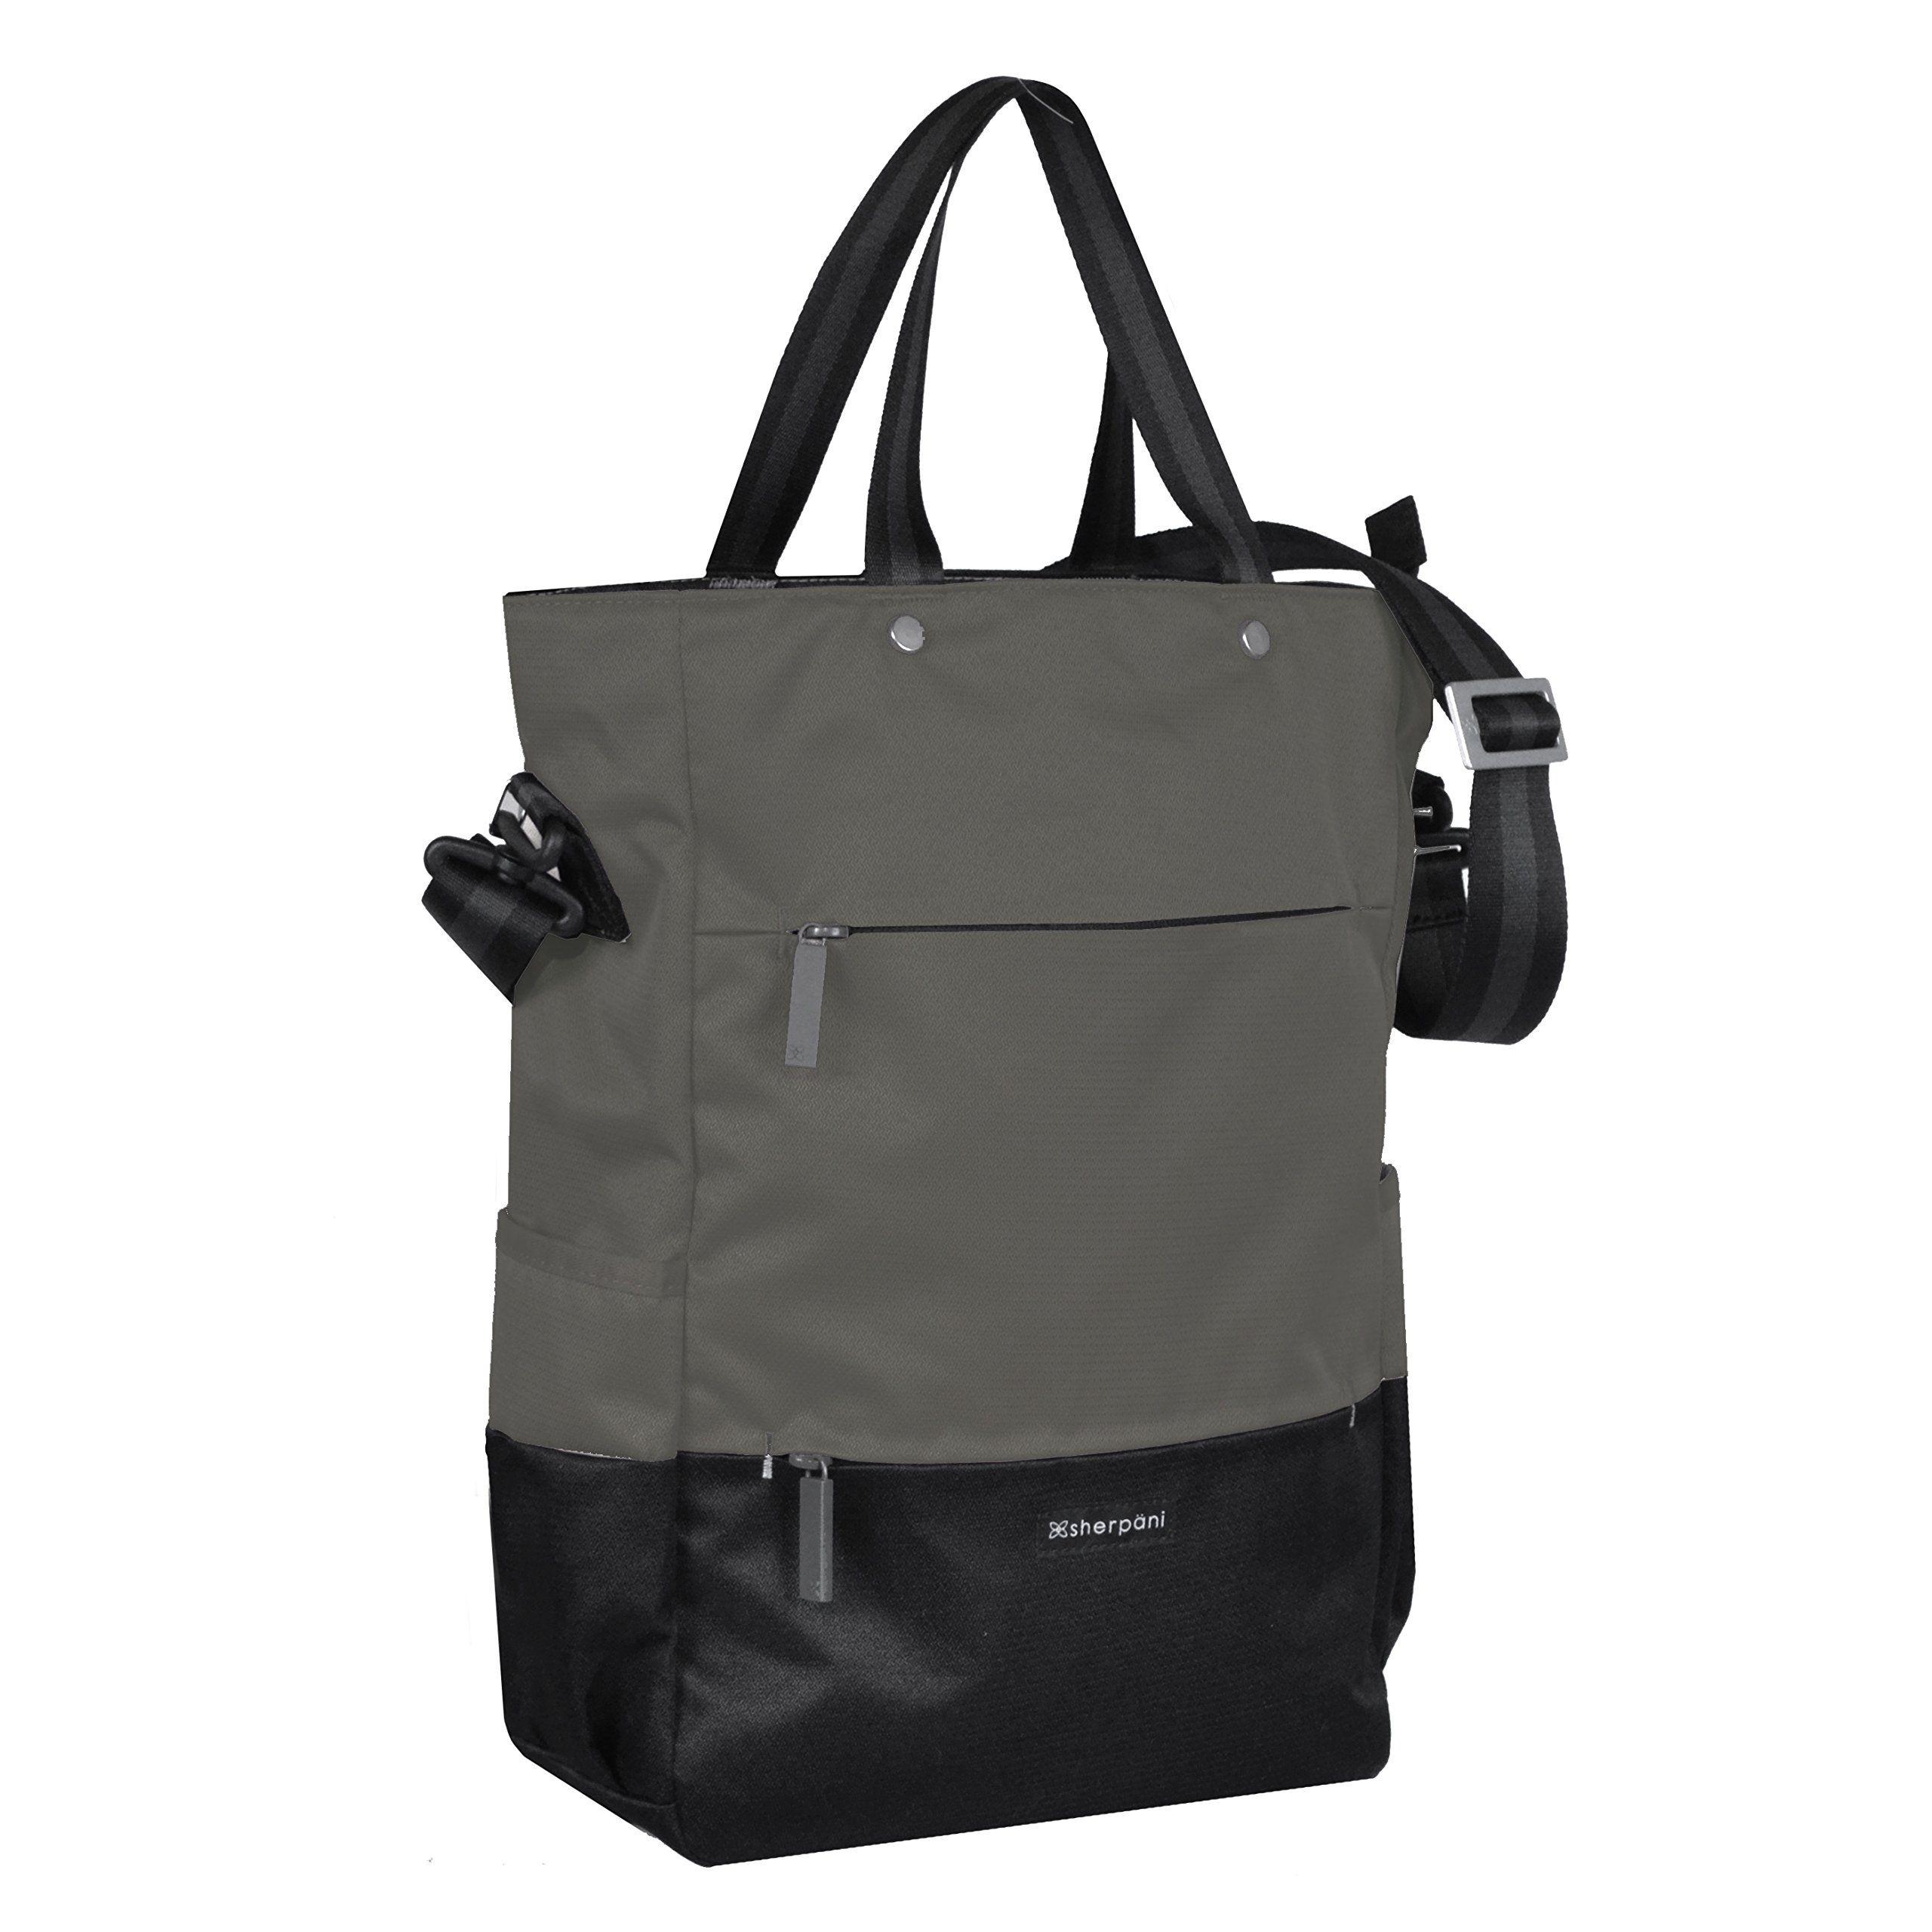 8523663a08 Sherpani Camden Backpack, Ash, One Size | Handbags - backpacks ...